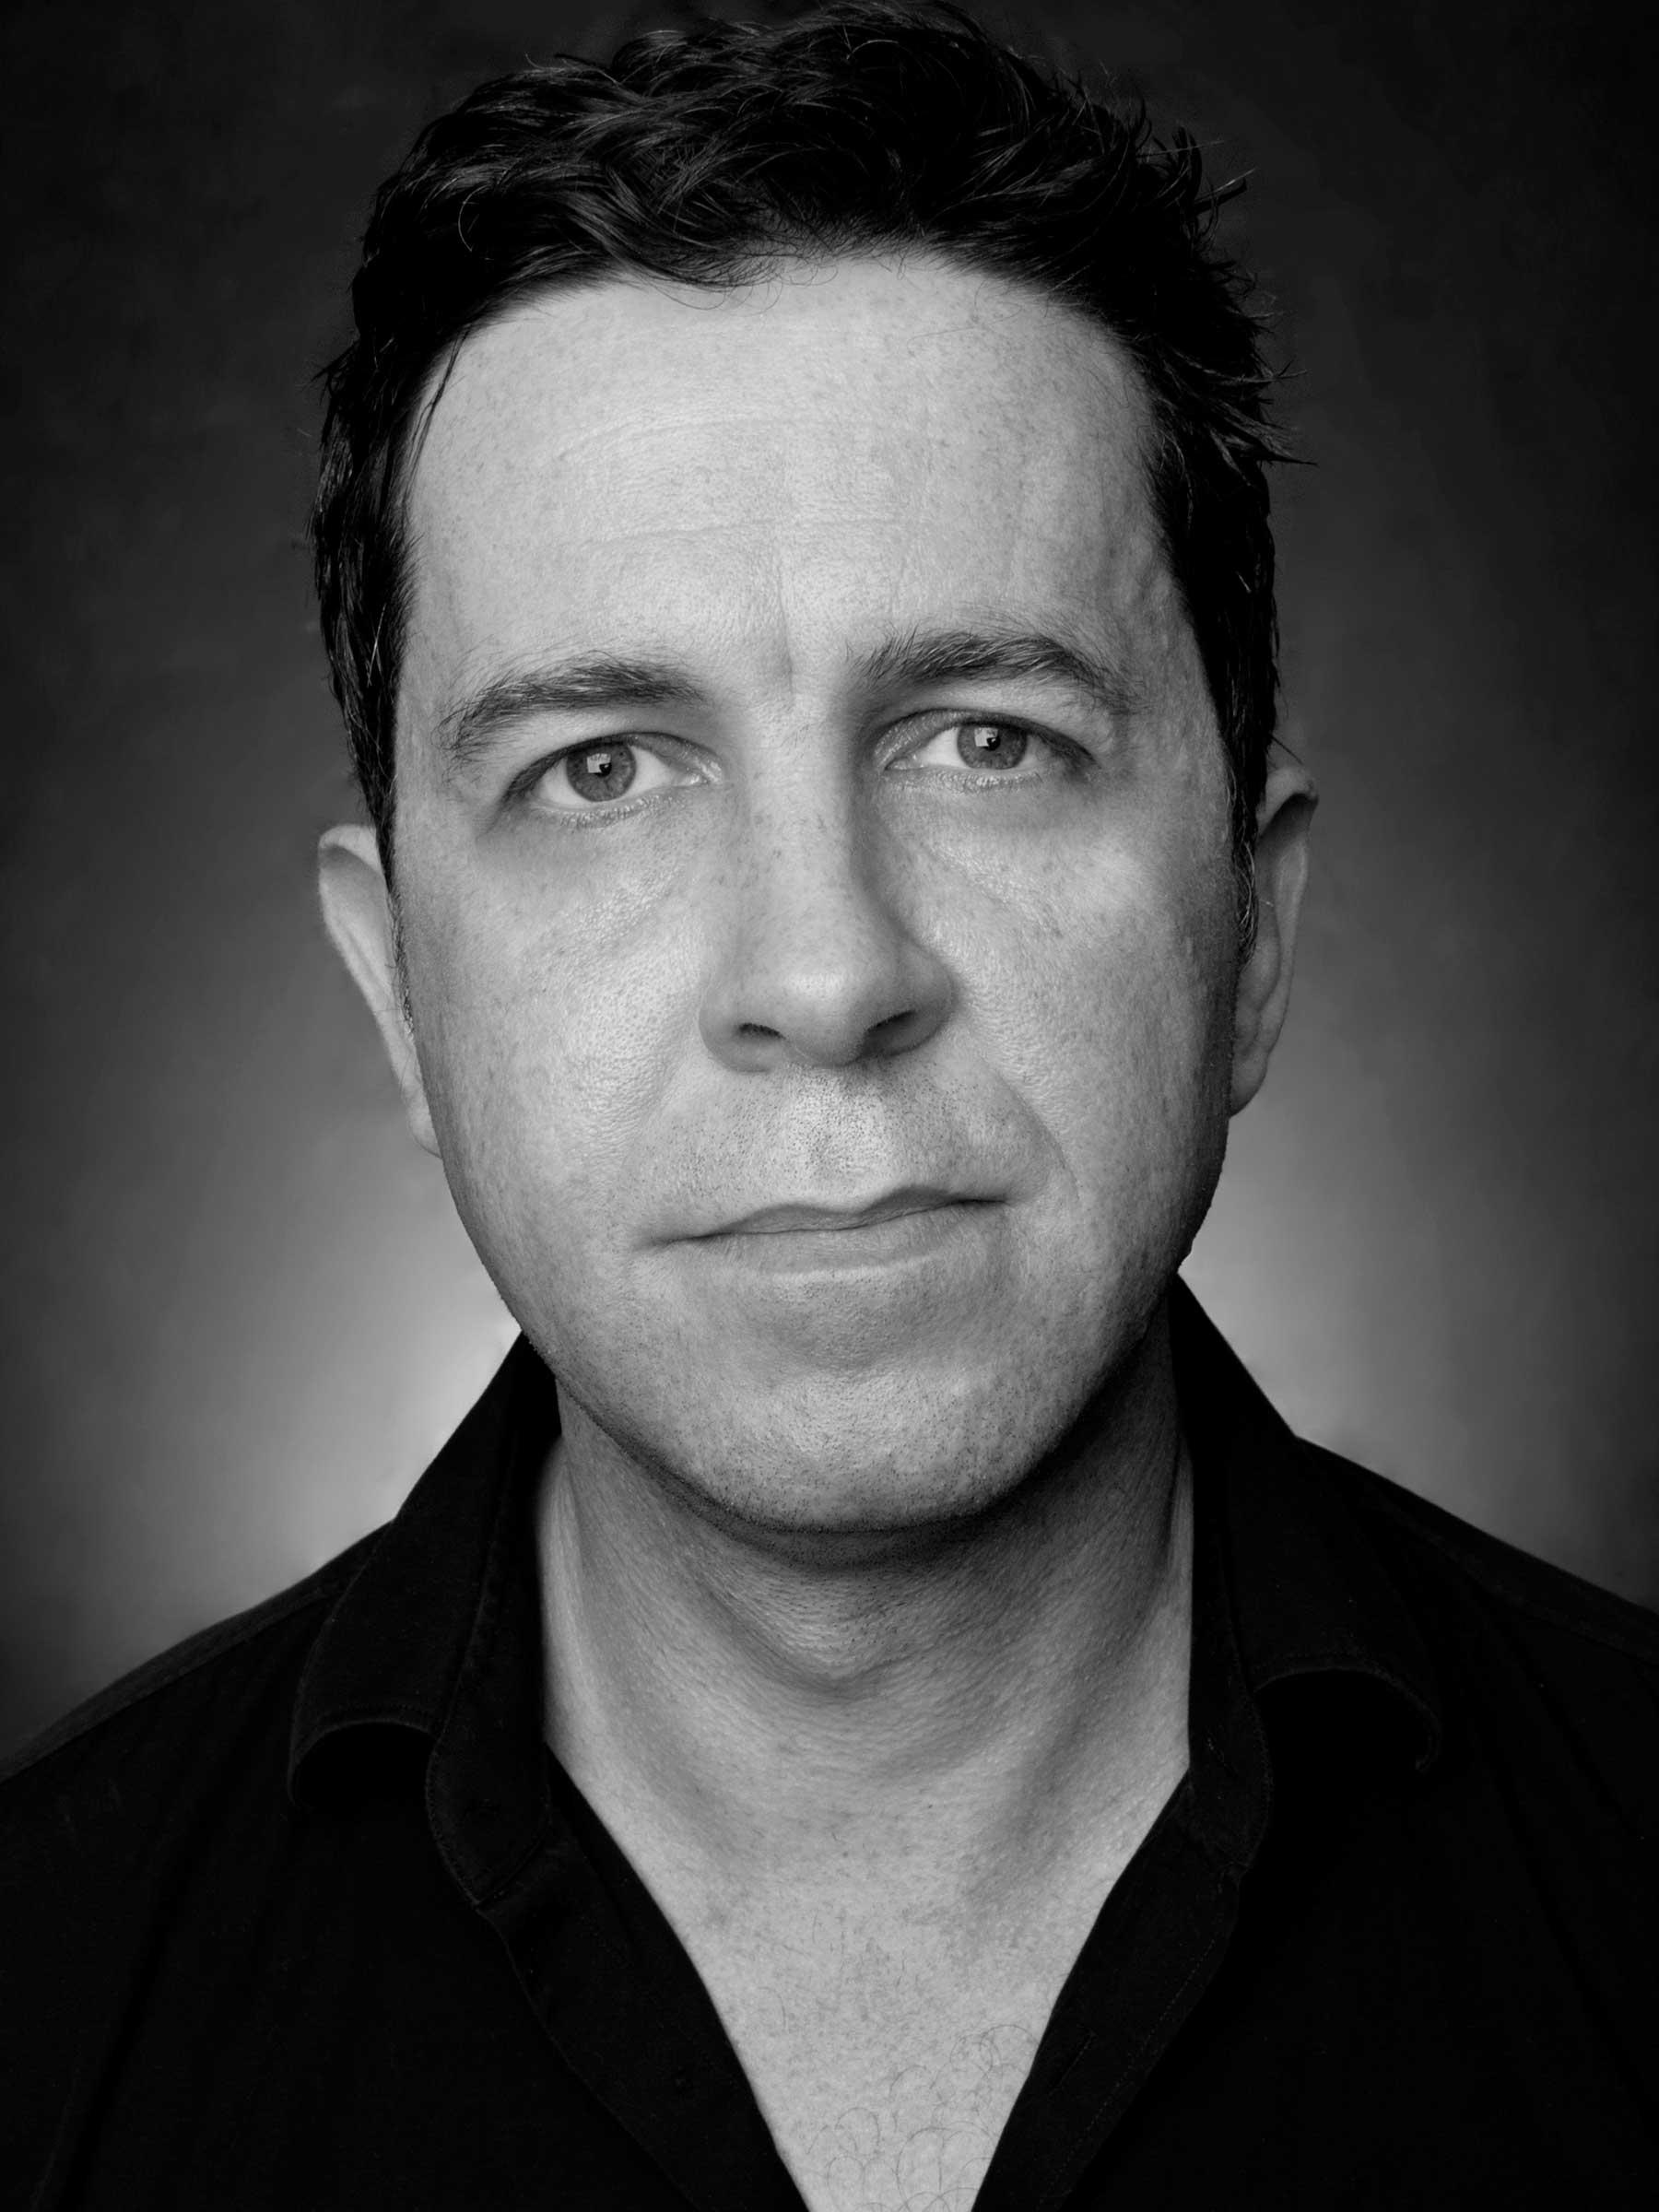 Portrait-Man-Actor-Headshot-Black-And-White-Philip-Murray-Photography-Dublin